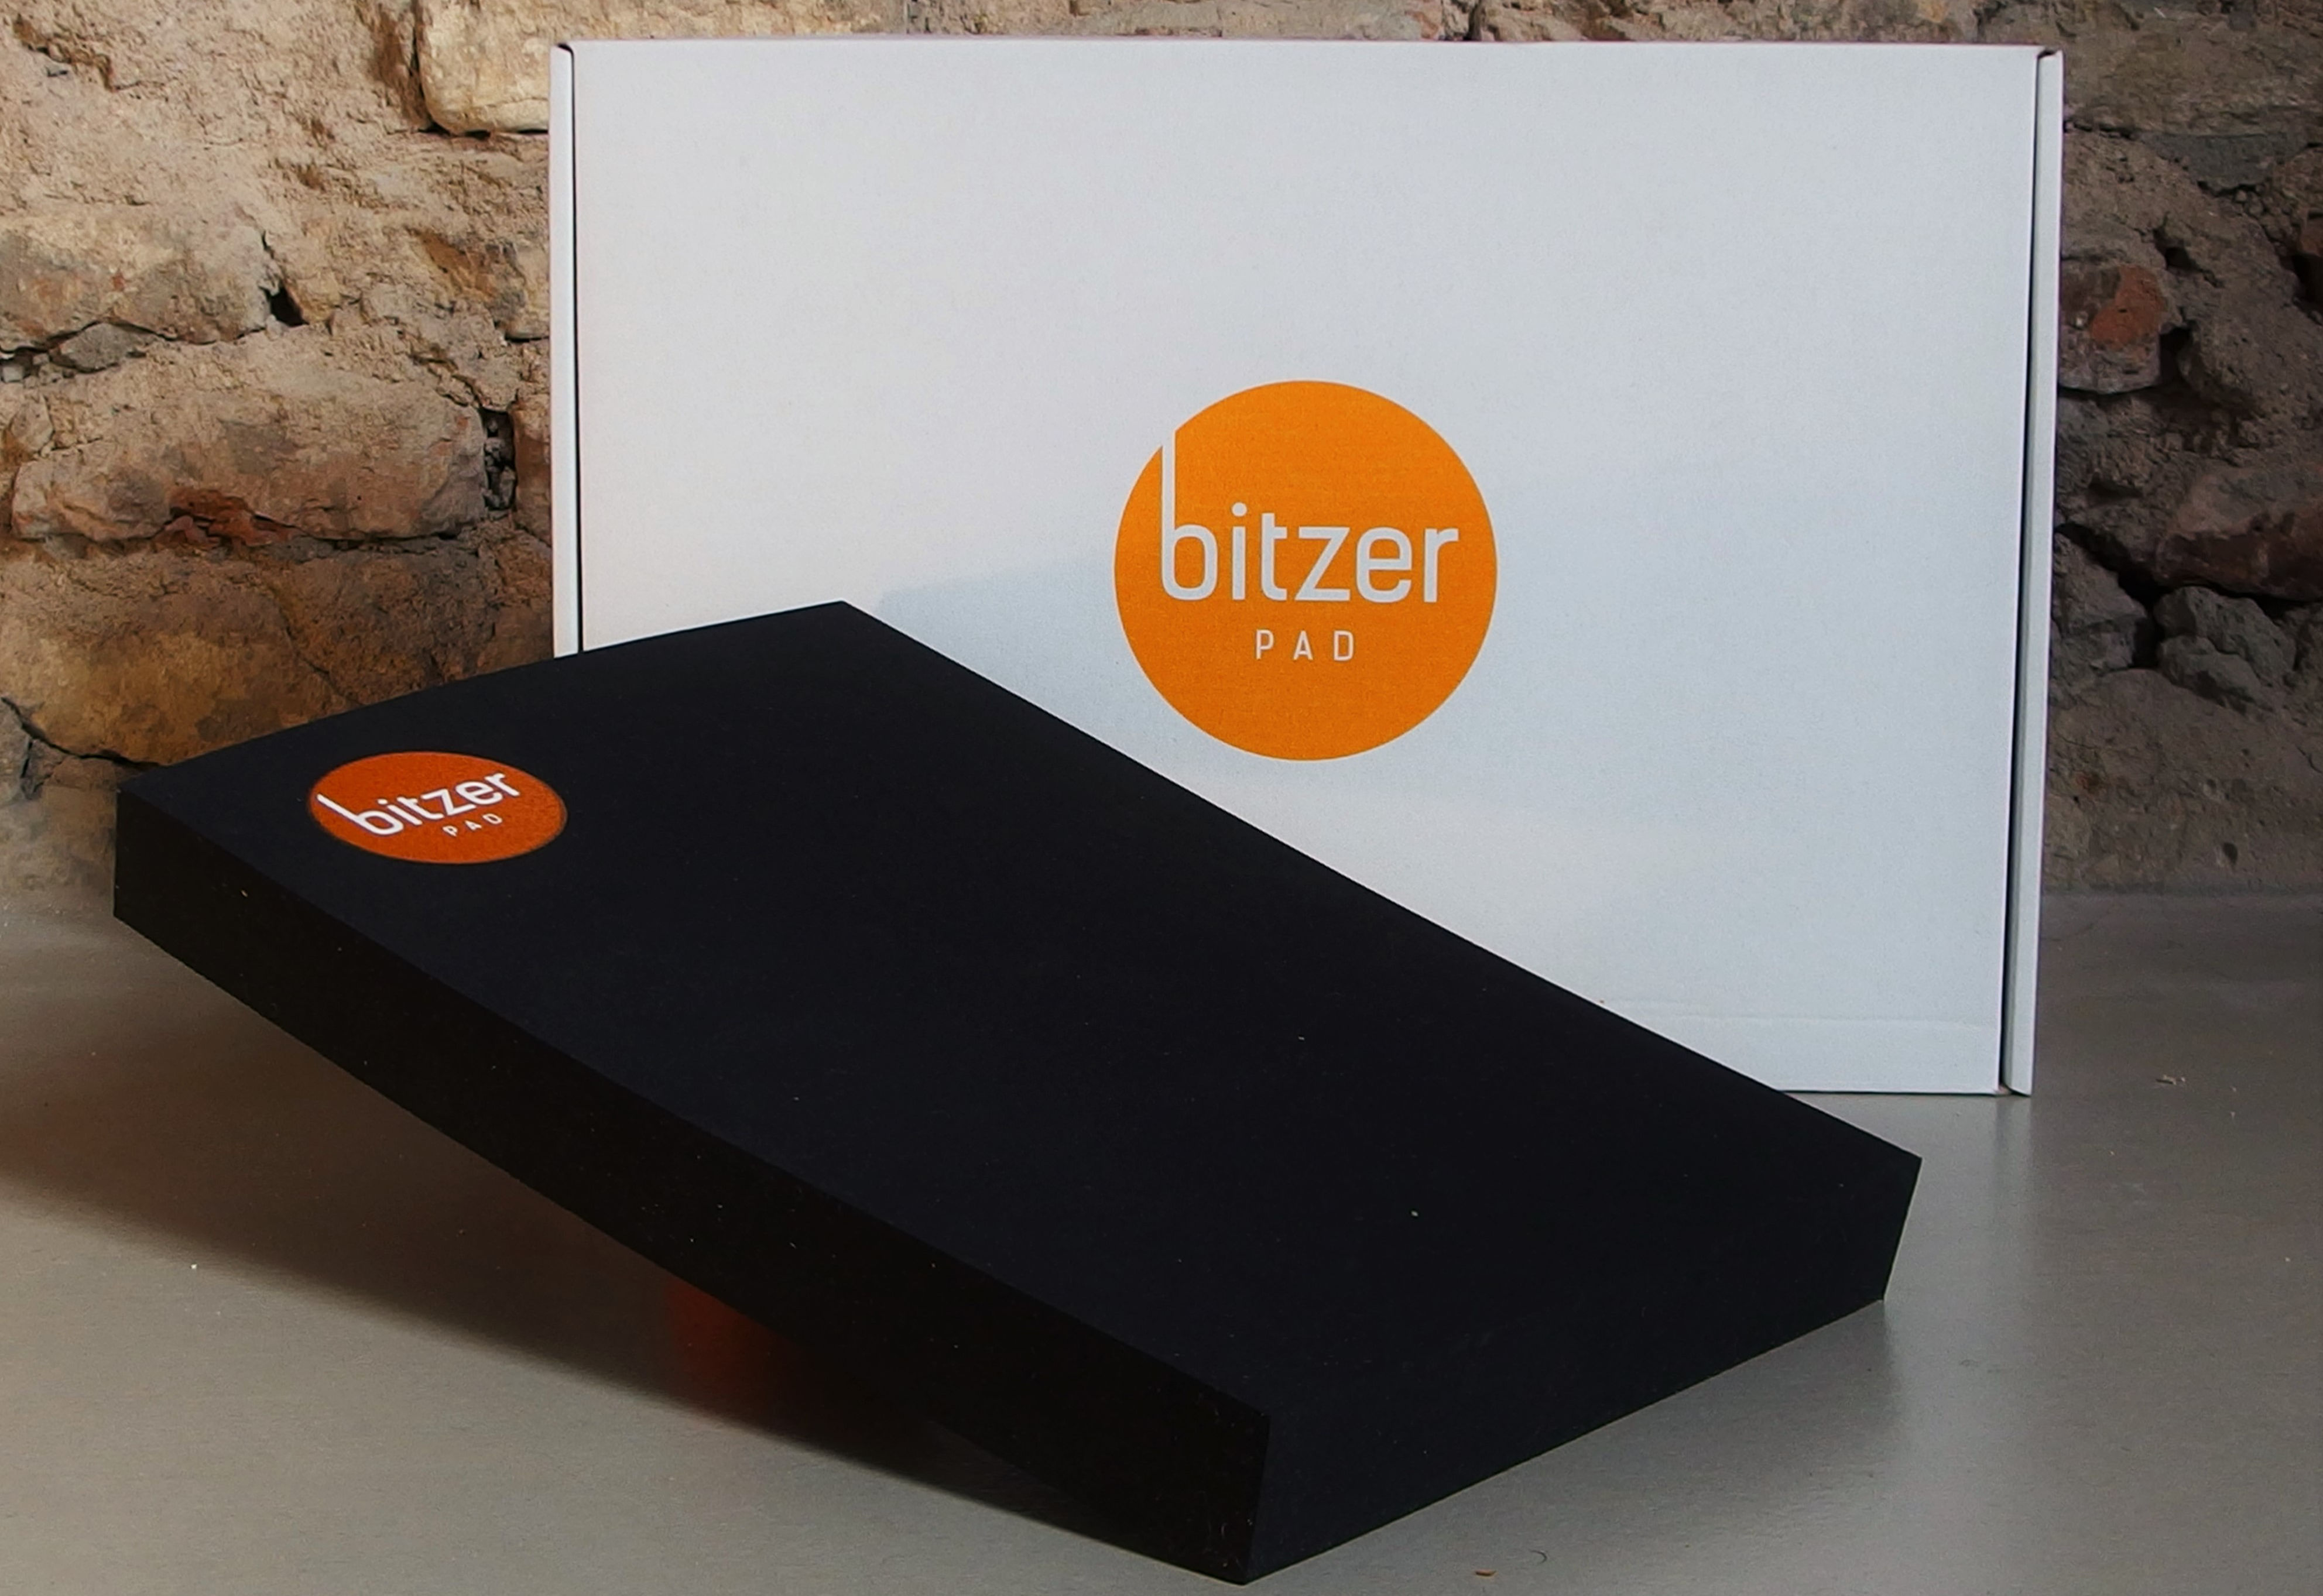 Das Bitzer-Pad